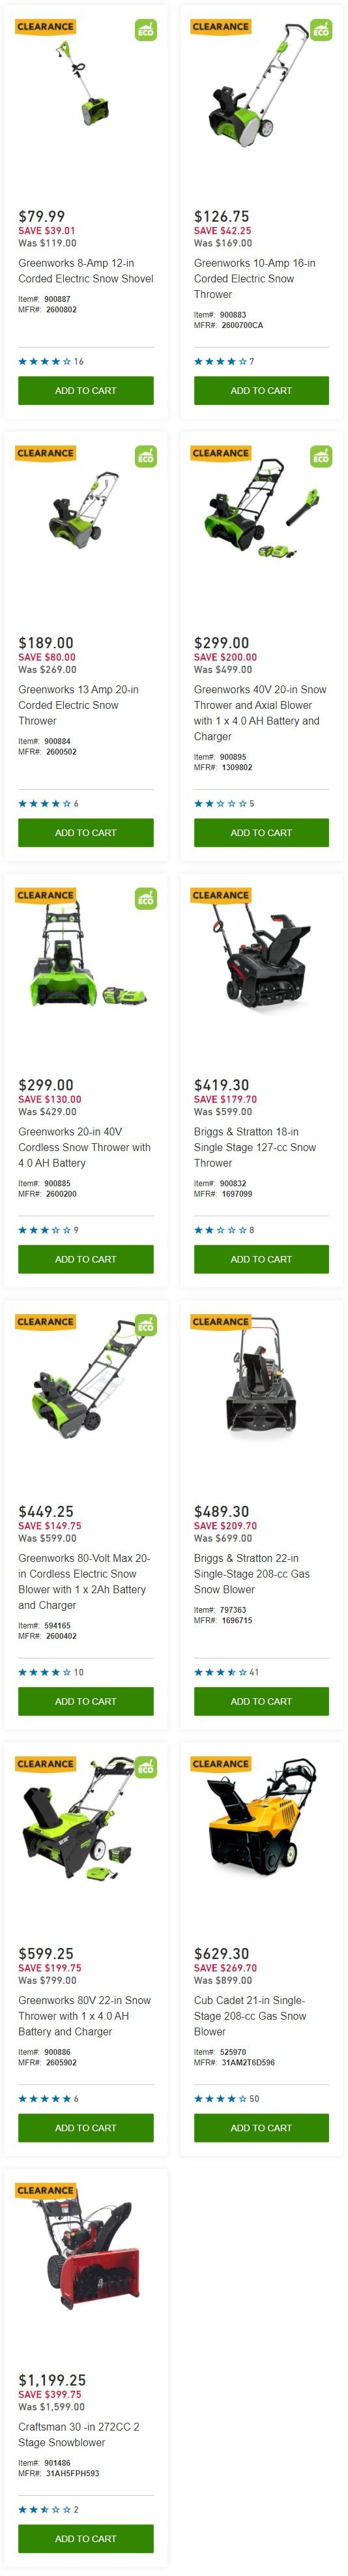 Lowe's精选多款汽油铲雪机、电动铲雪机、无绳铲雪机 79.99加元起清仓!